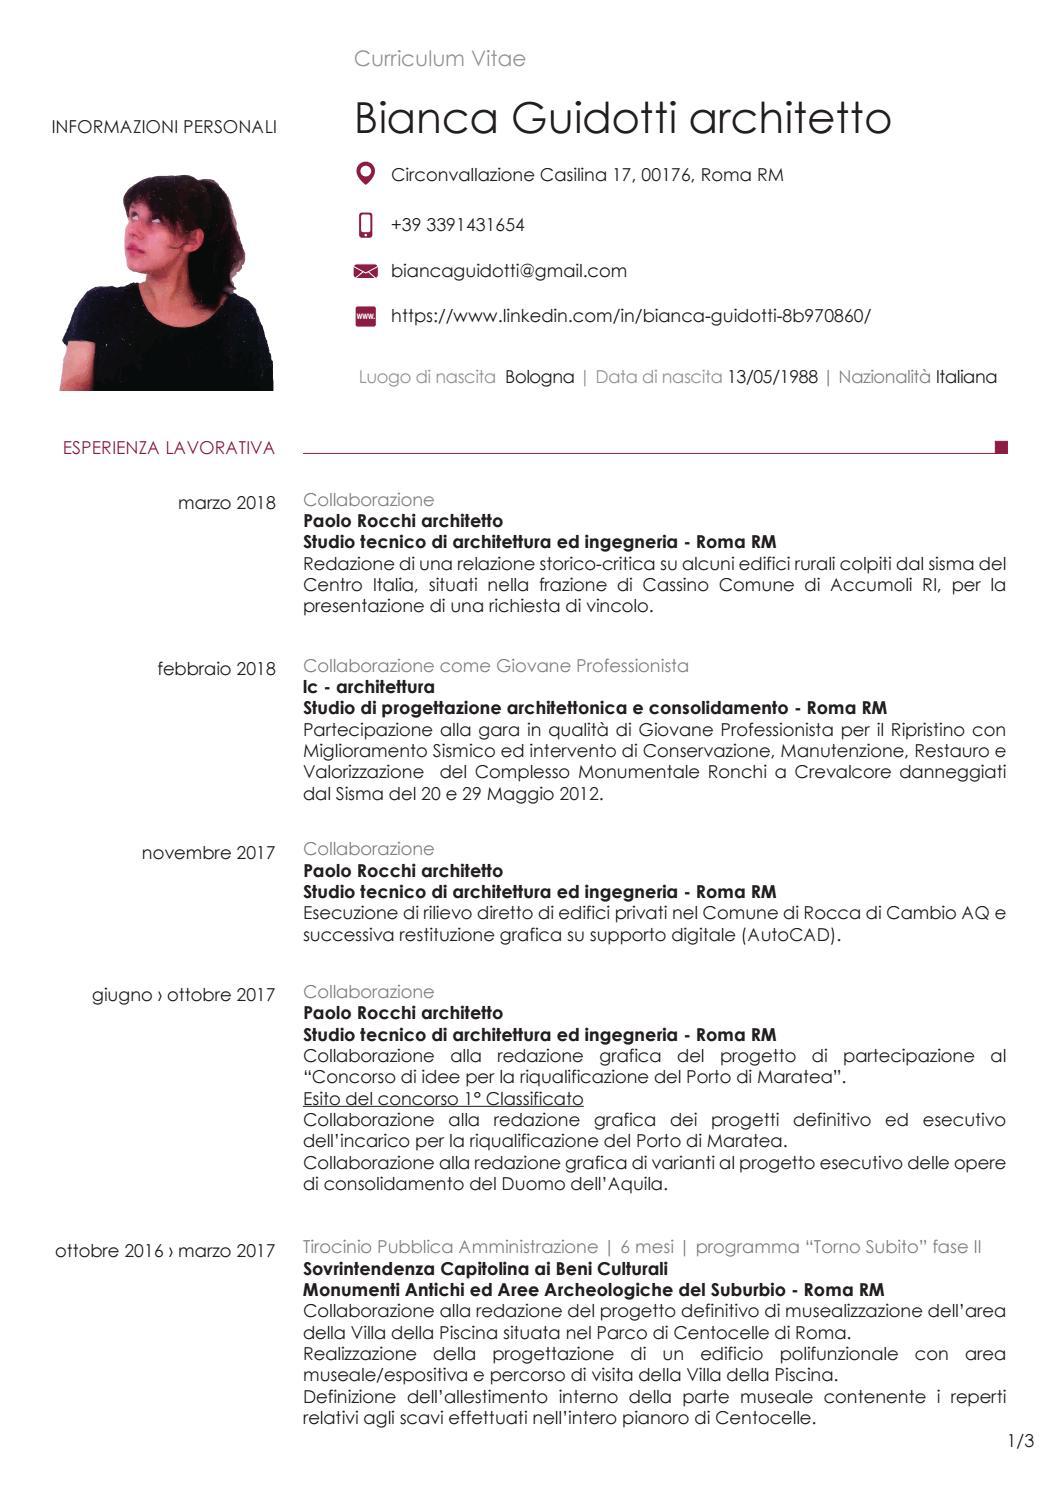 Cv Guidotti Bianca 2018 By 13biancaful Issuu